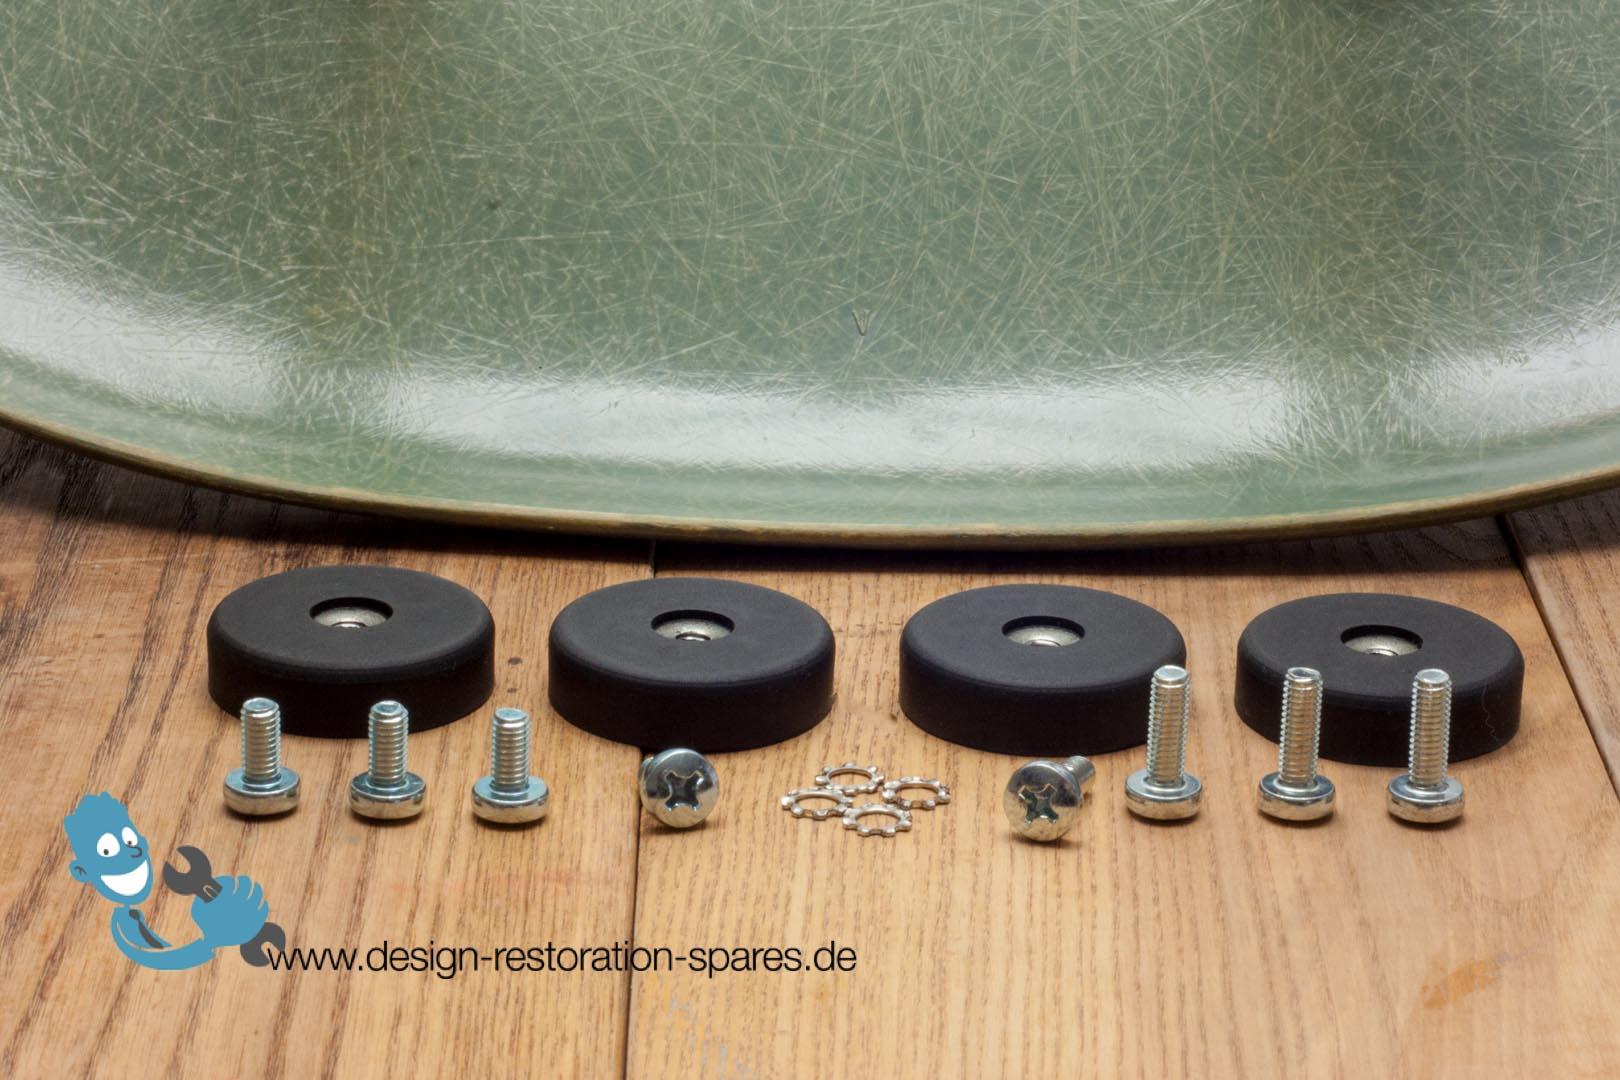 Replacement shock mounts for eames fiberglas chairs - Eames chair shock mounts ...